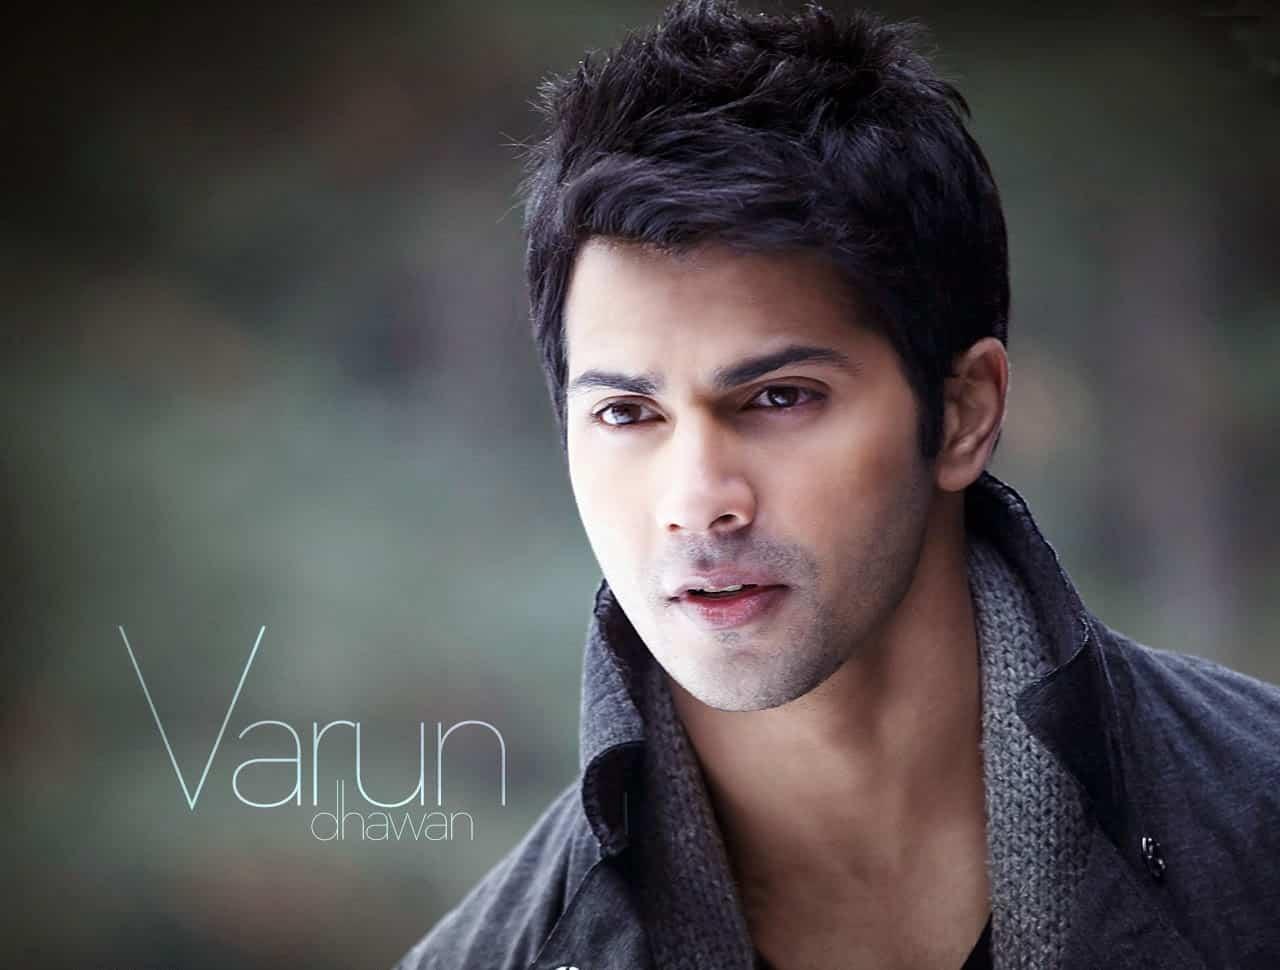 varun dhawan - photo #4